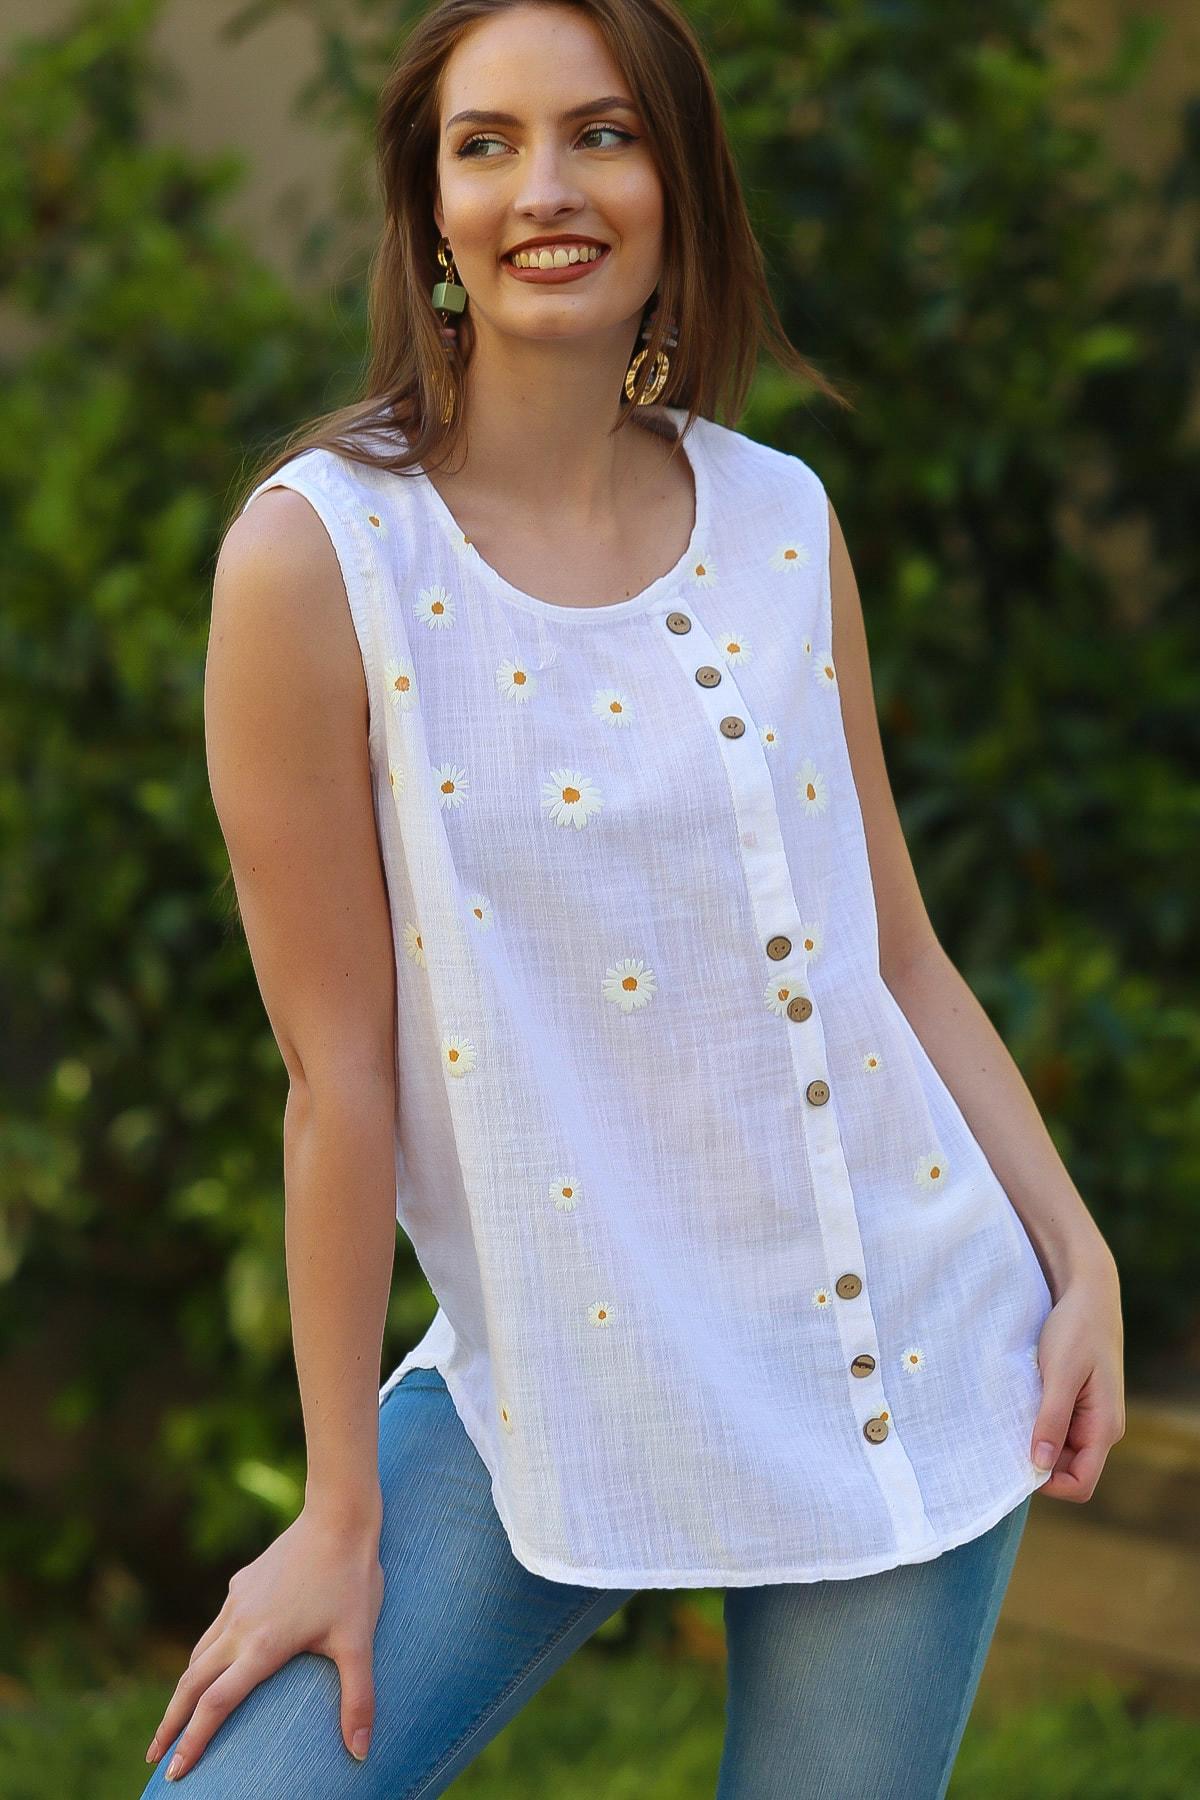 Kadın Beyaz Sıfır Yaka Papatya Baskılı Düğme Detaylı Kolsuz Dokuma Bluz M10010200BL95325